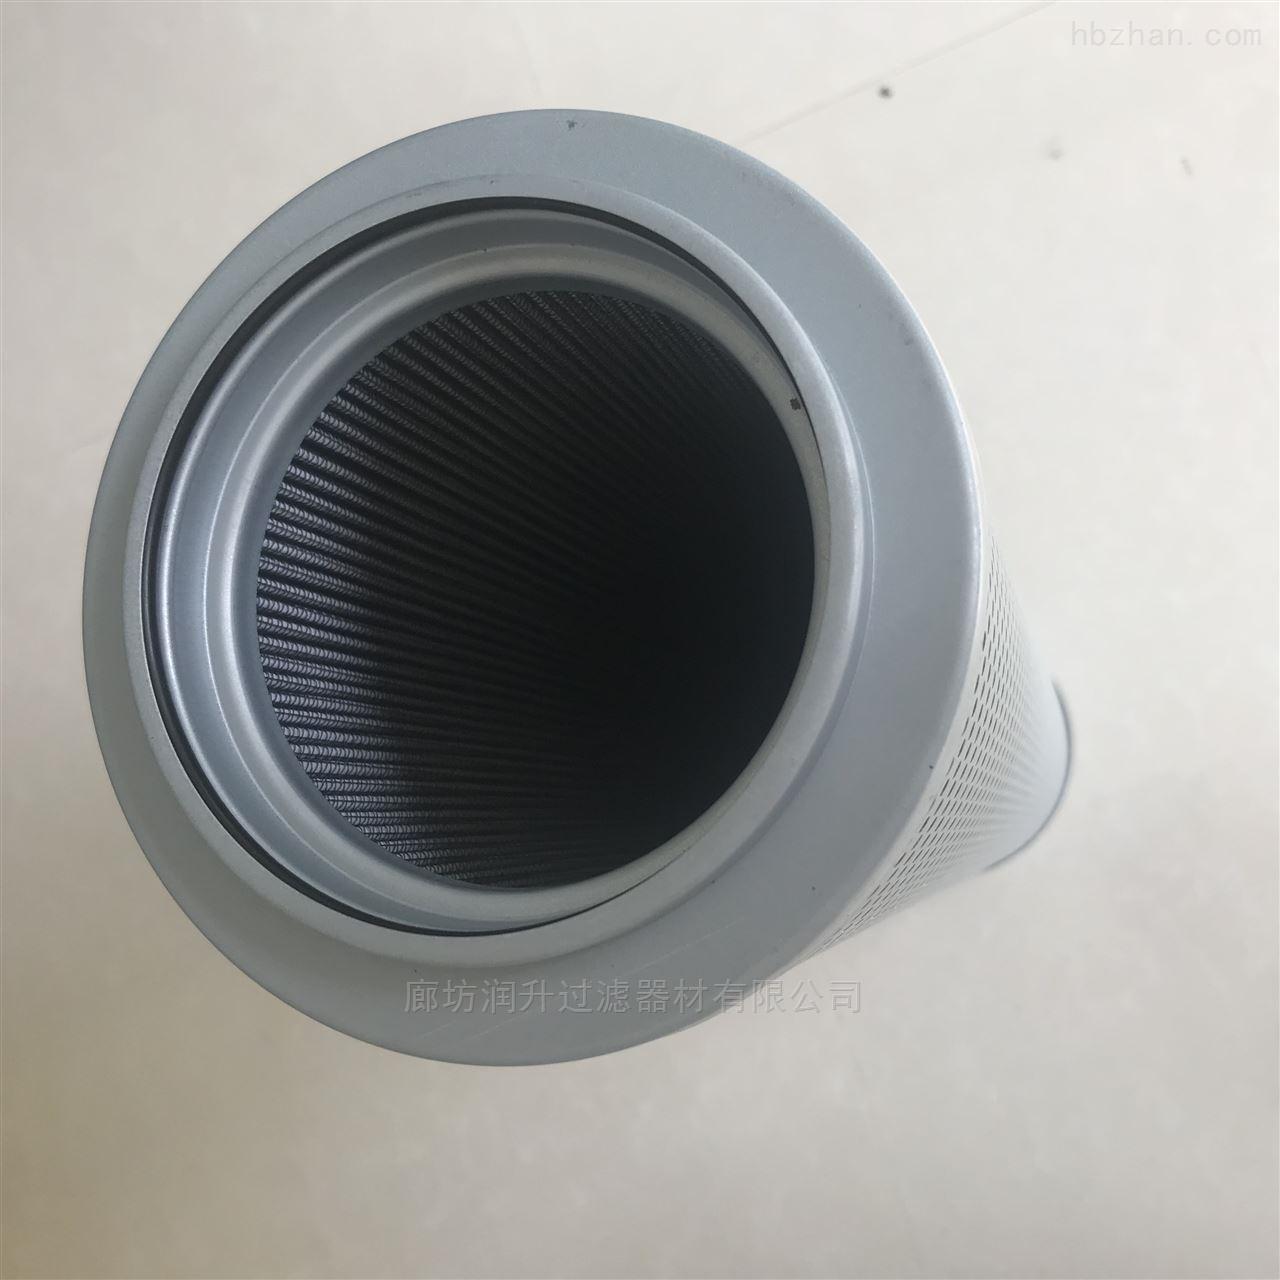 安徽DFM40PP005A01滤芯厂家价格